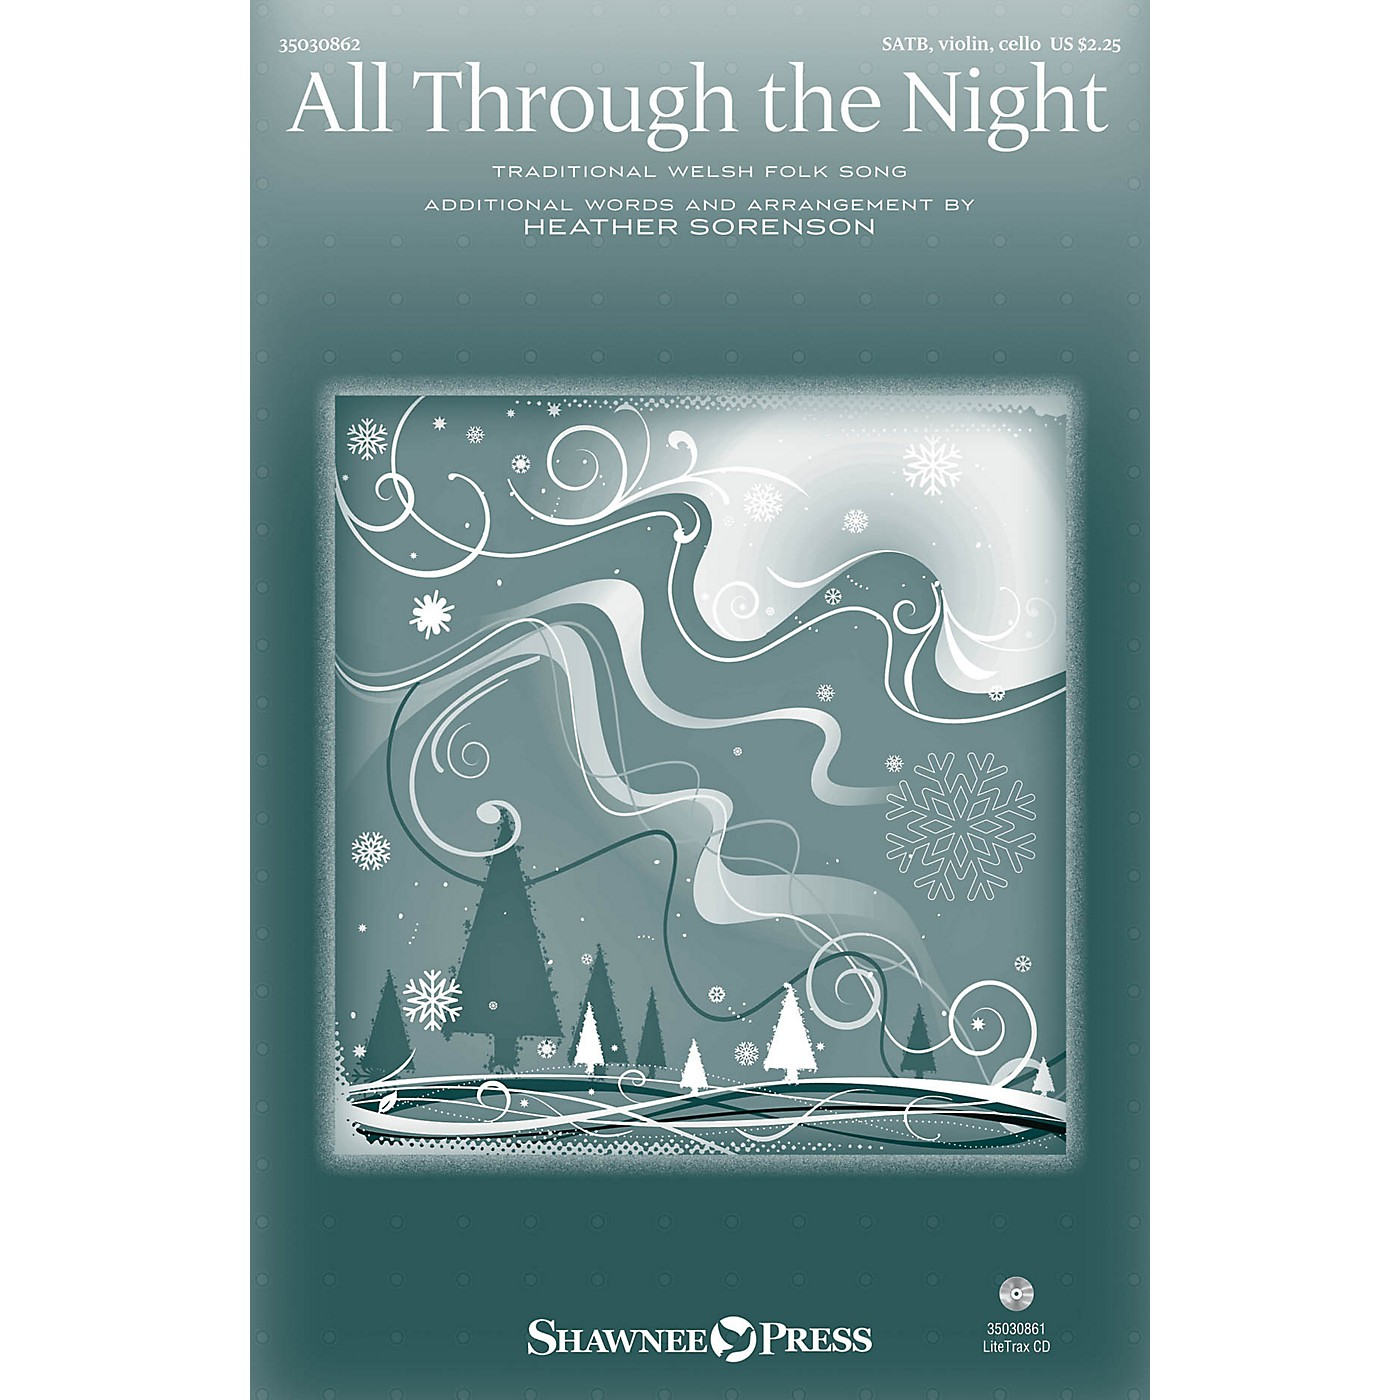 Shawnee Press All Through the Night SATB W/ VIOLIN AND CELLO arranged by Heather Sorenson thumbnail